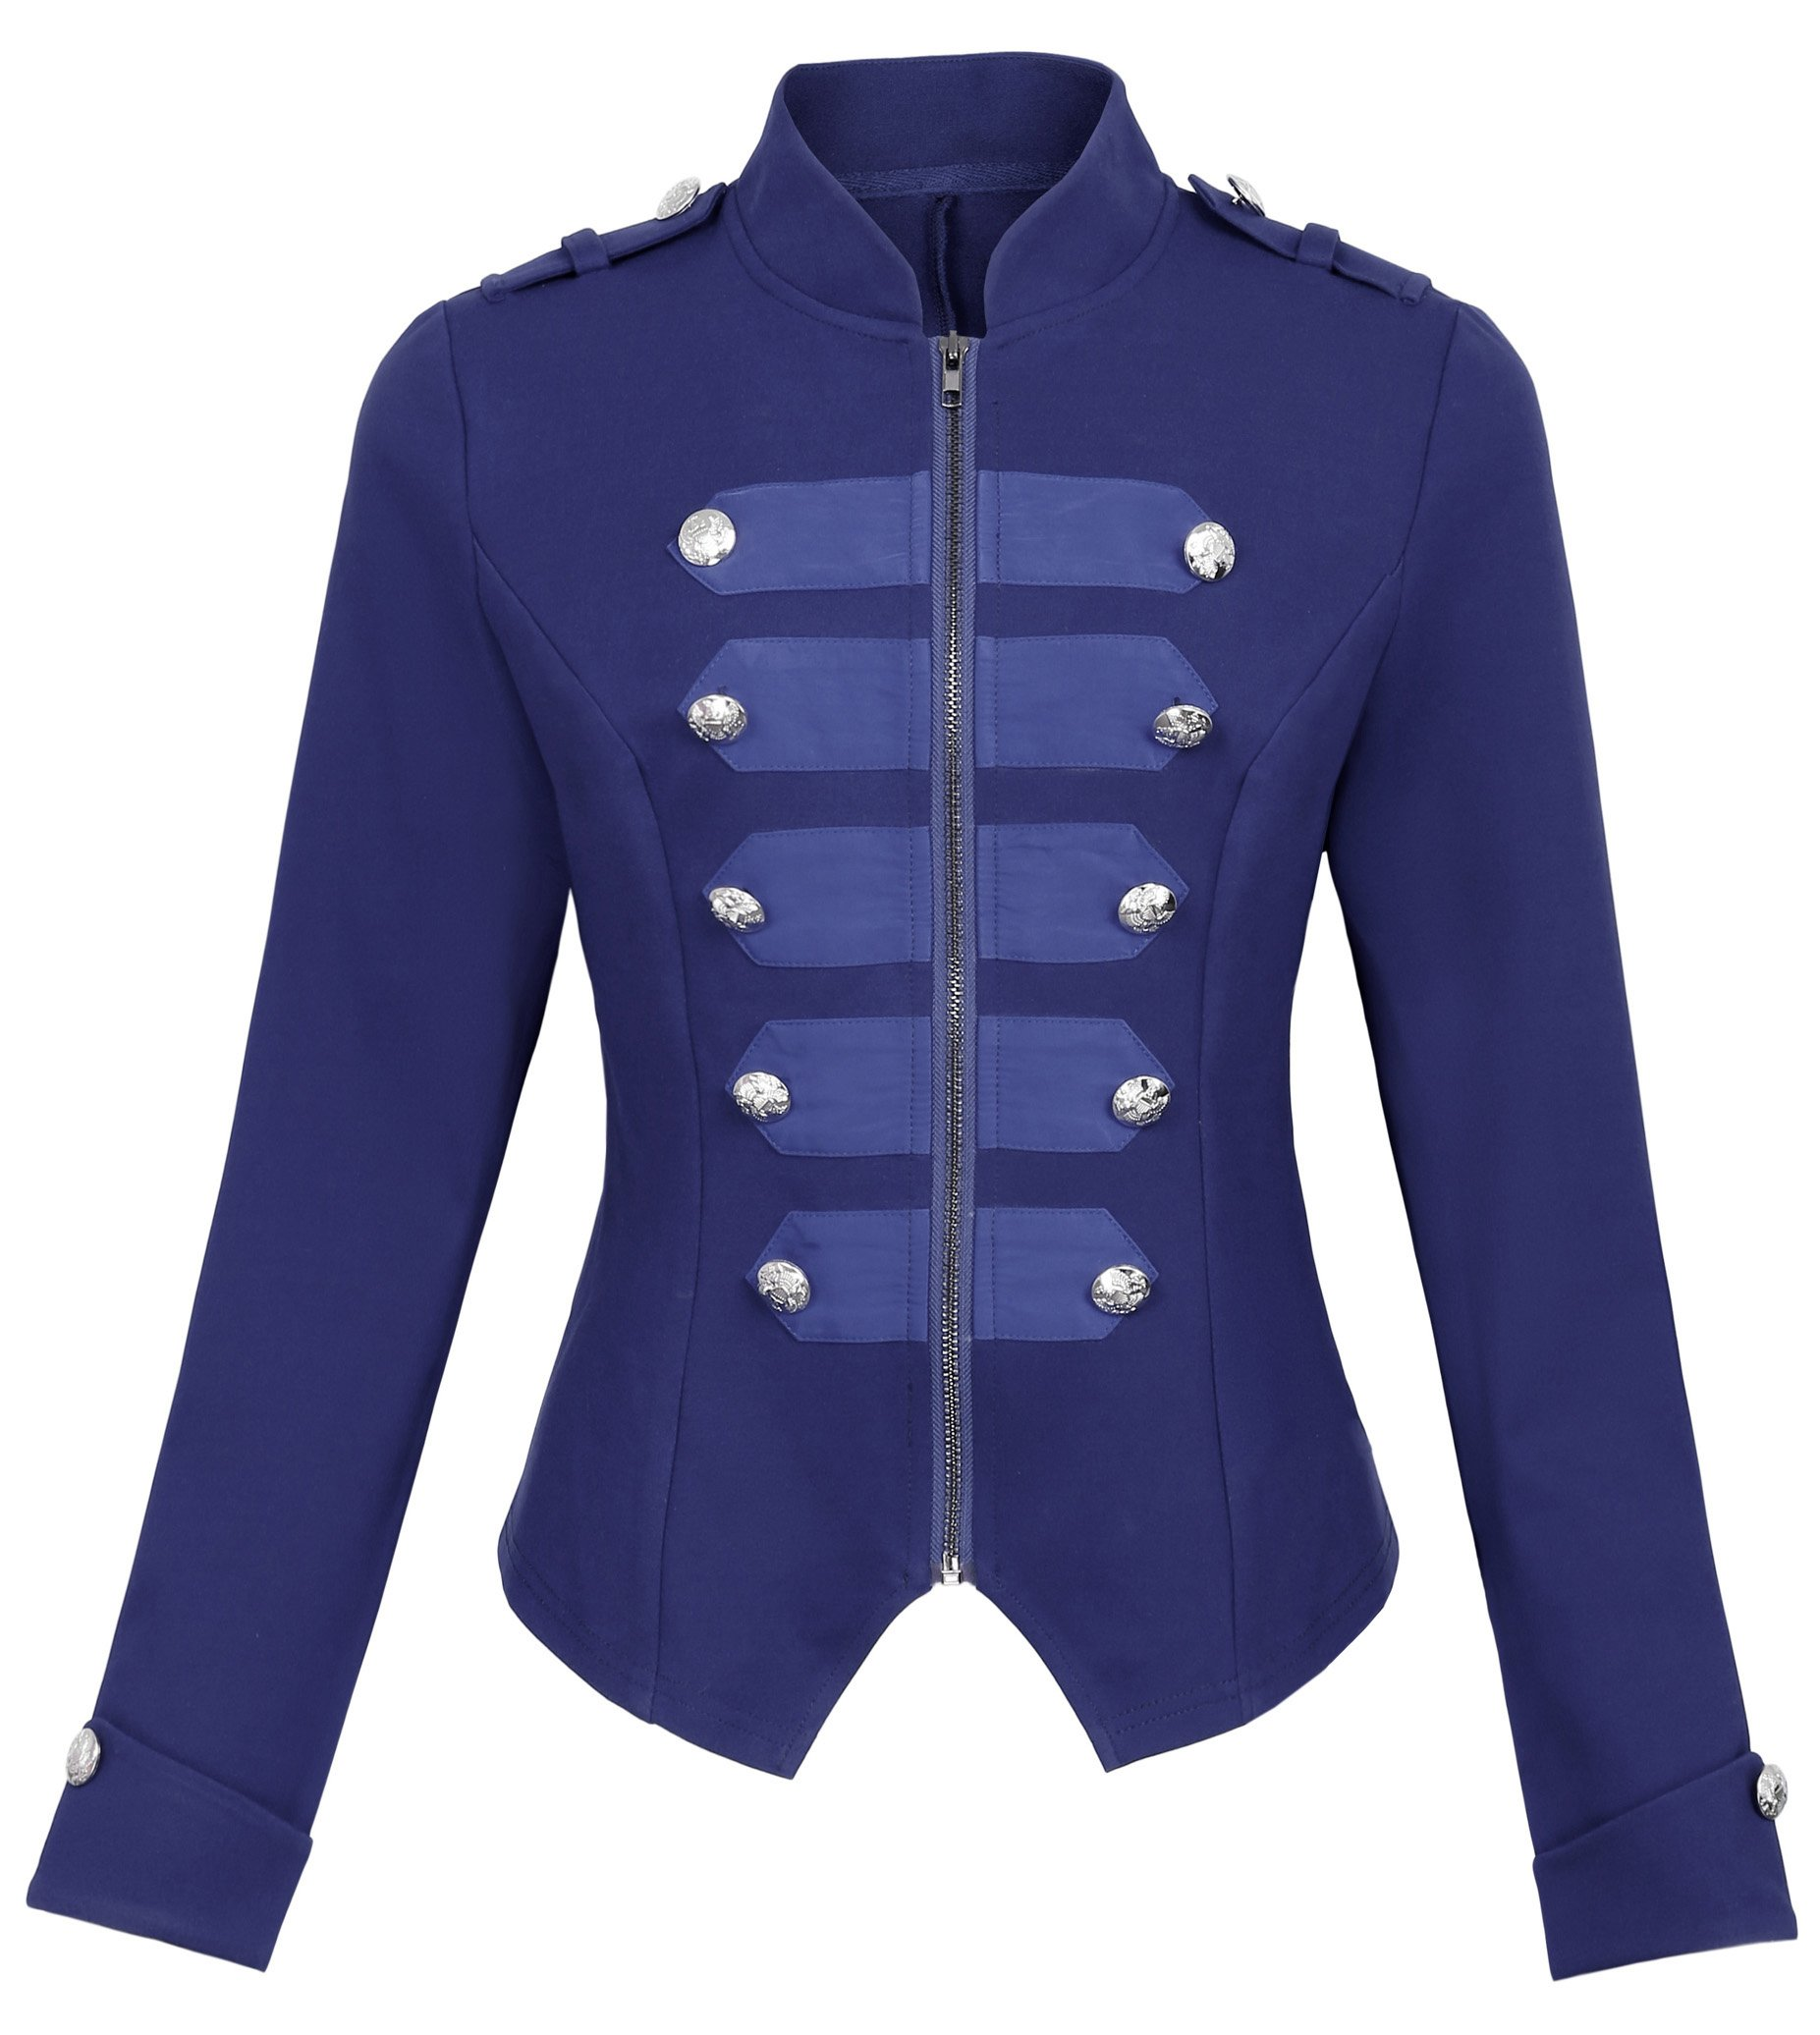 Kate Kasin Women's Steampunk Marching Band Jacket Military Ringmaster Blazer KK464-4 Navy Blue Size L